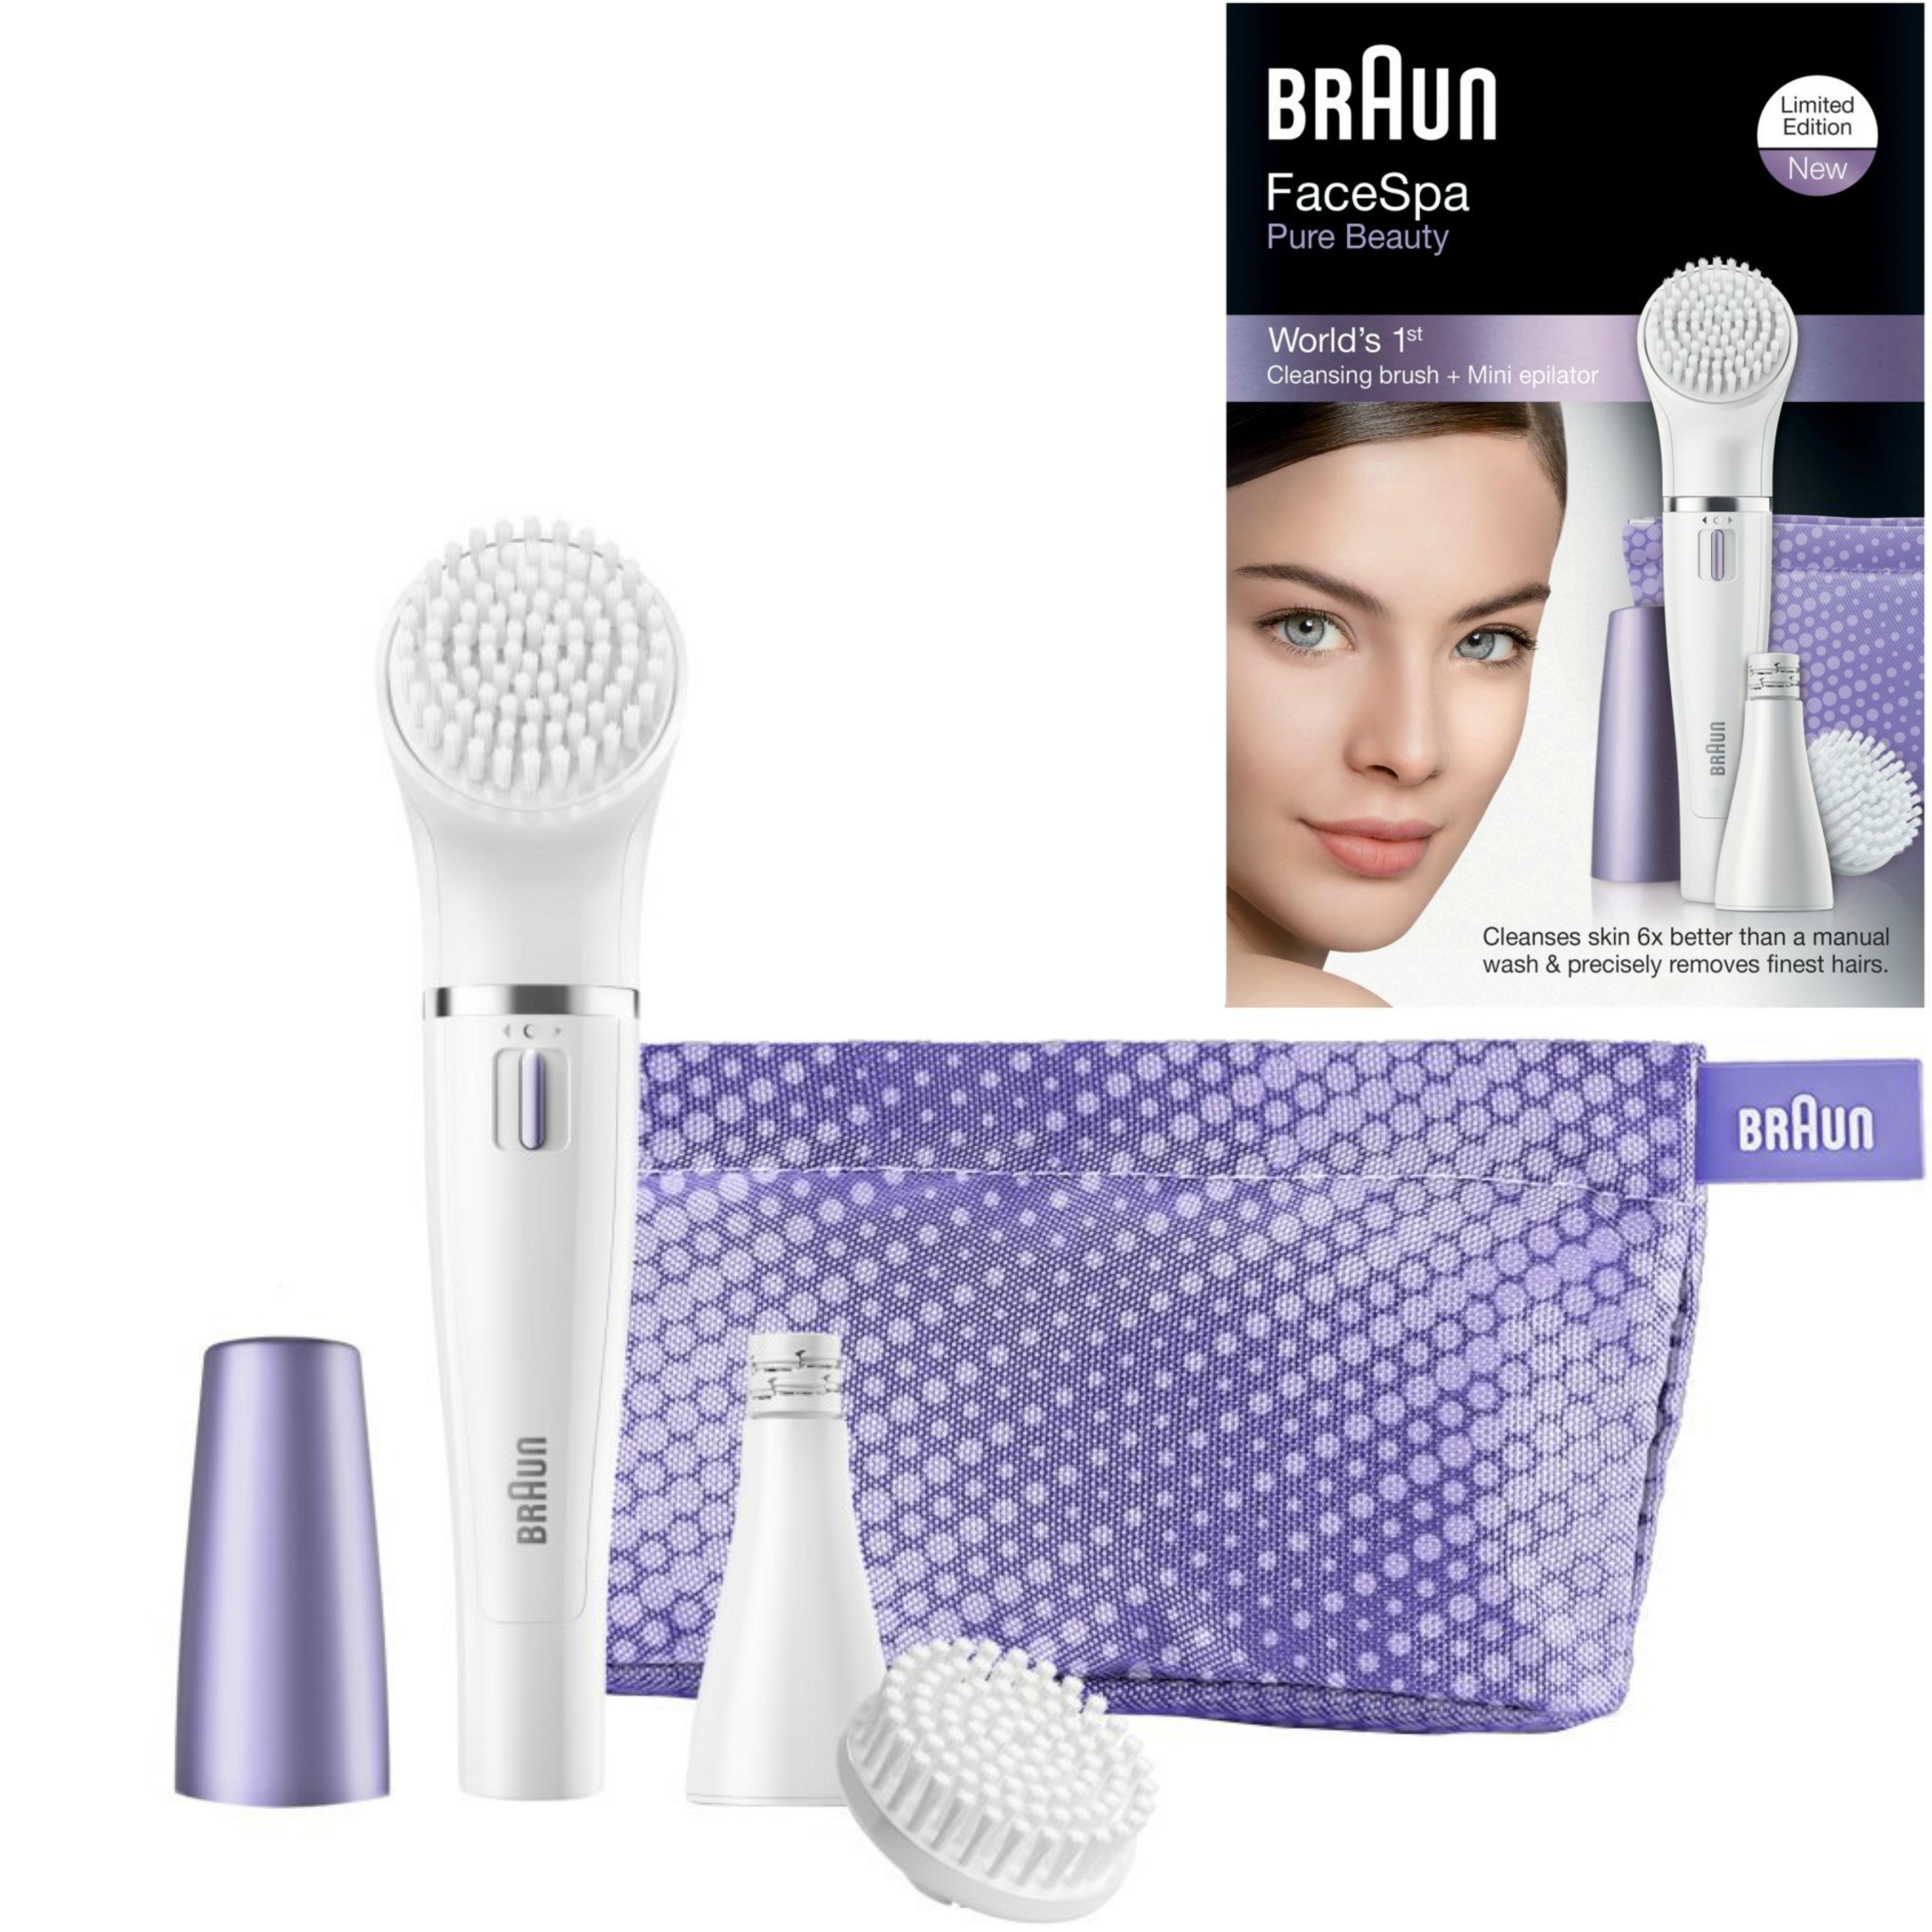 Braun FaceSpa Mini Facial Epilator & Cleansing Brush | Removes Finest Hair | SE832